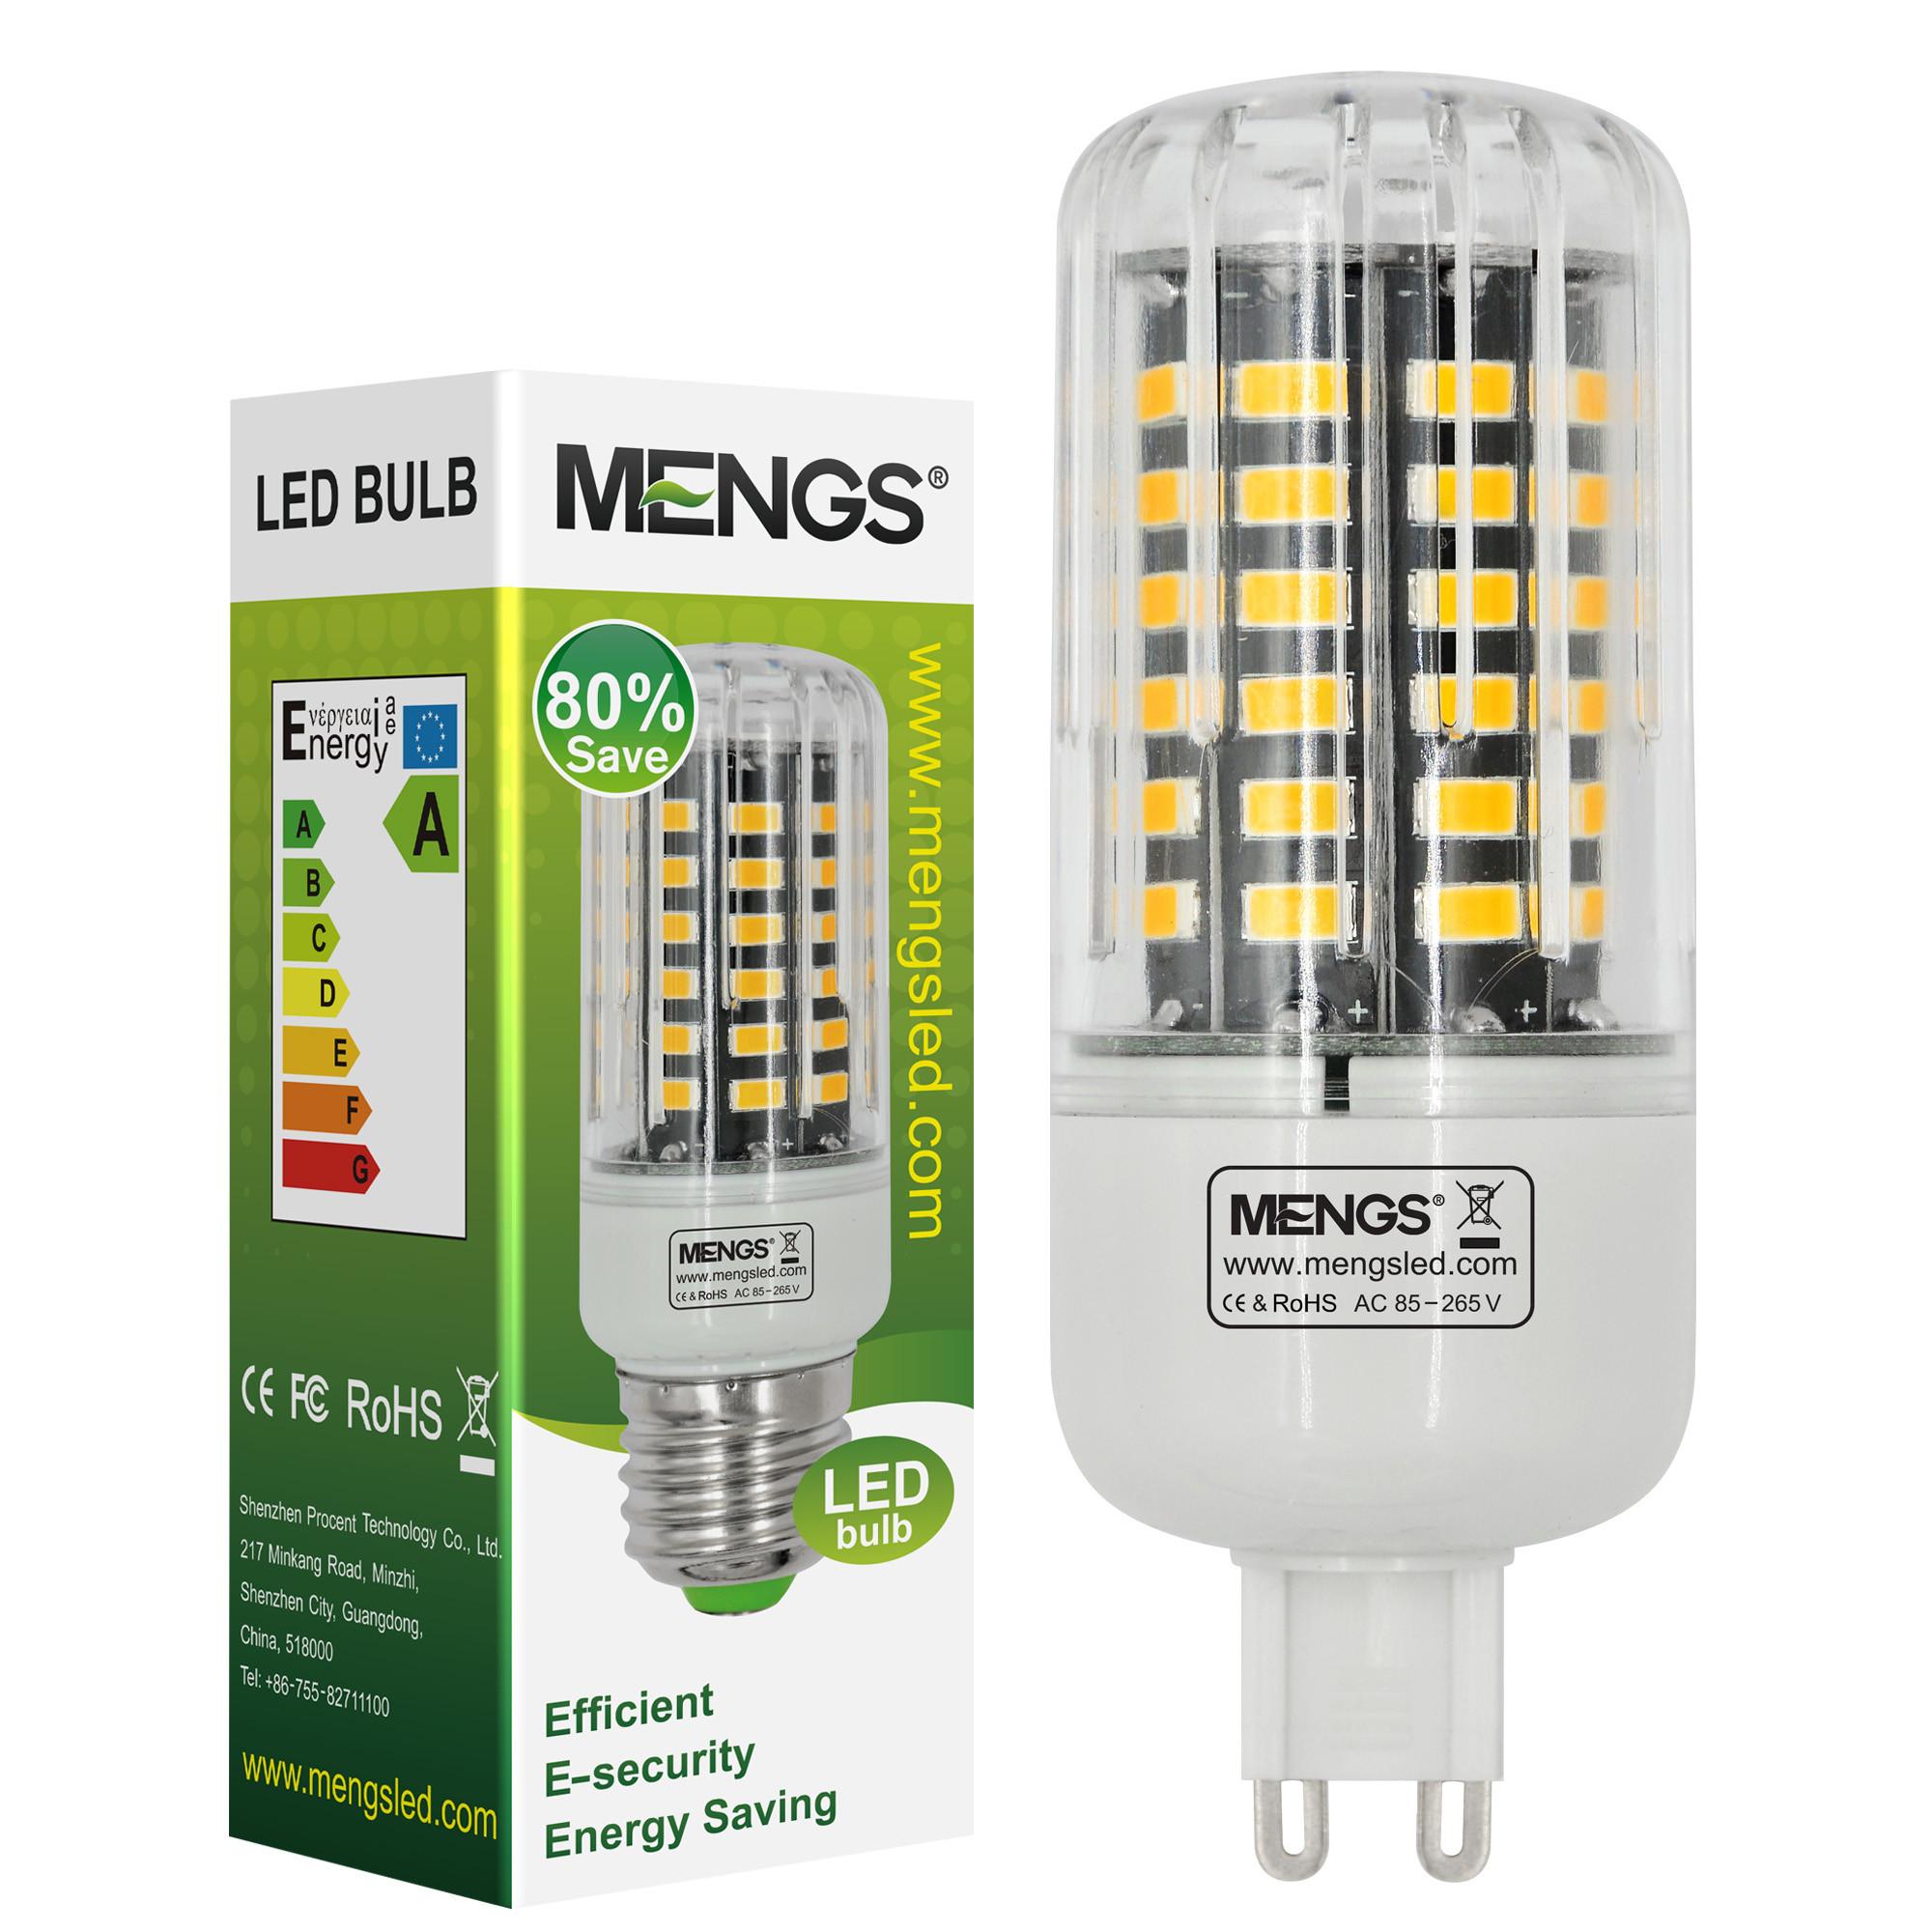 anti strobe g9 7w led corn light 56x 5736 smd led bulb lamp in warm white energy saving lamp. Black Bedroom Furniture Sets. Home Design Ideas